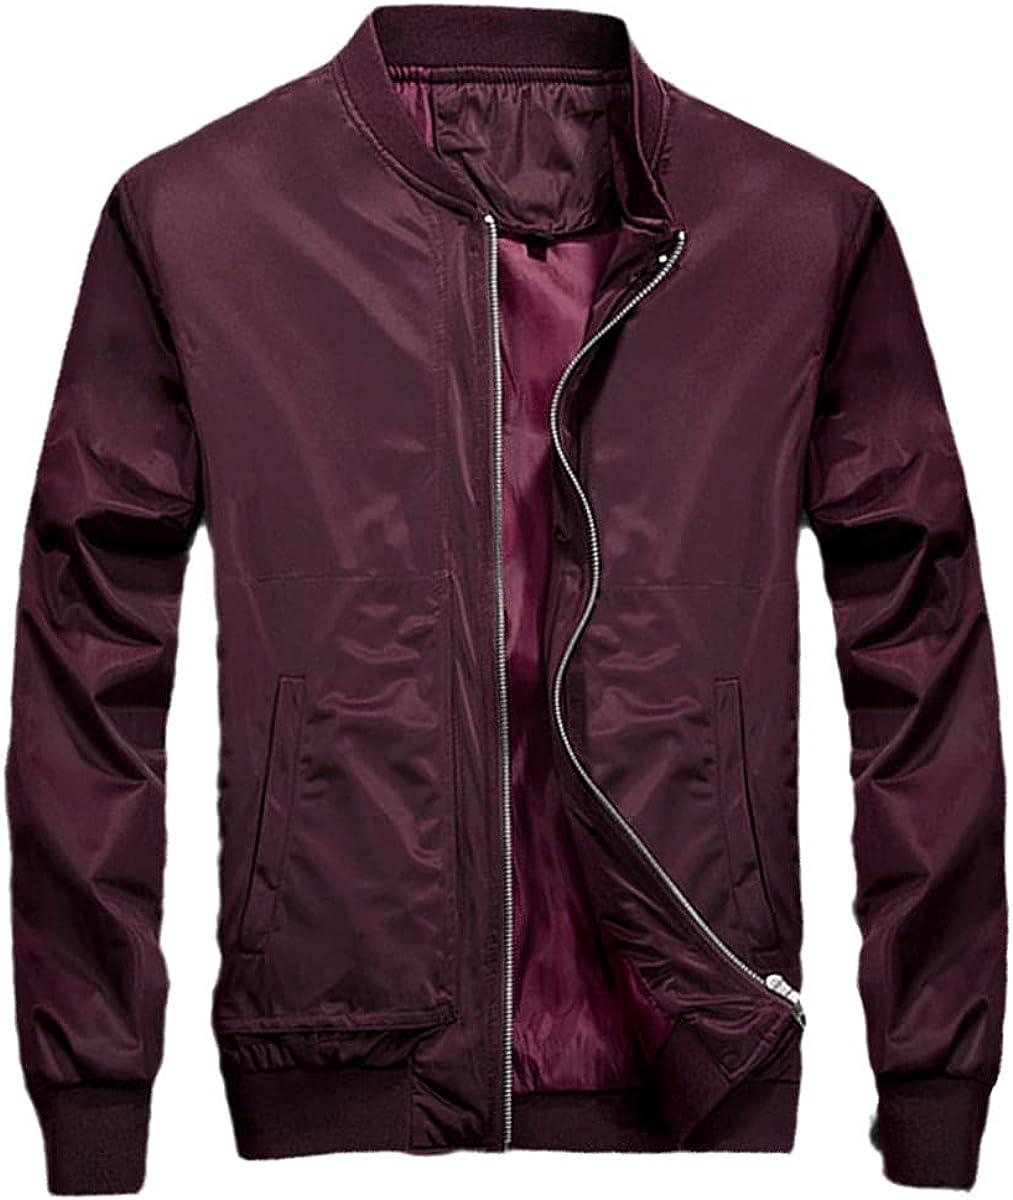 Men's Bomber Jacket Thin Baseball Jacket Coat Solid Color Casual Jacket Coat